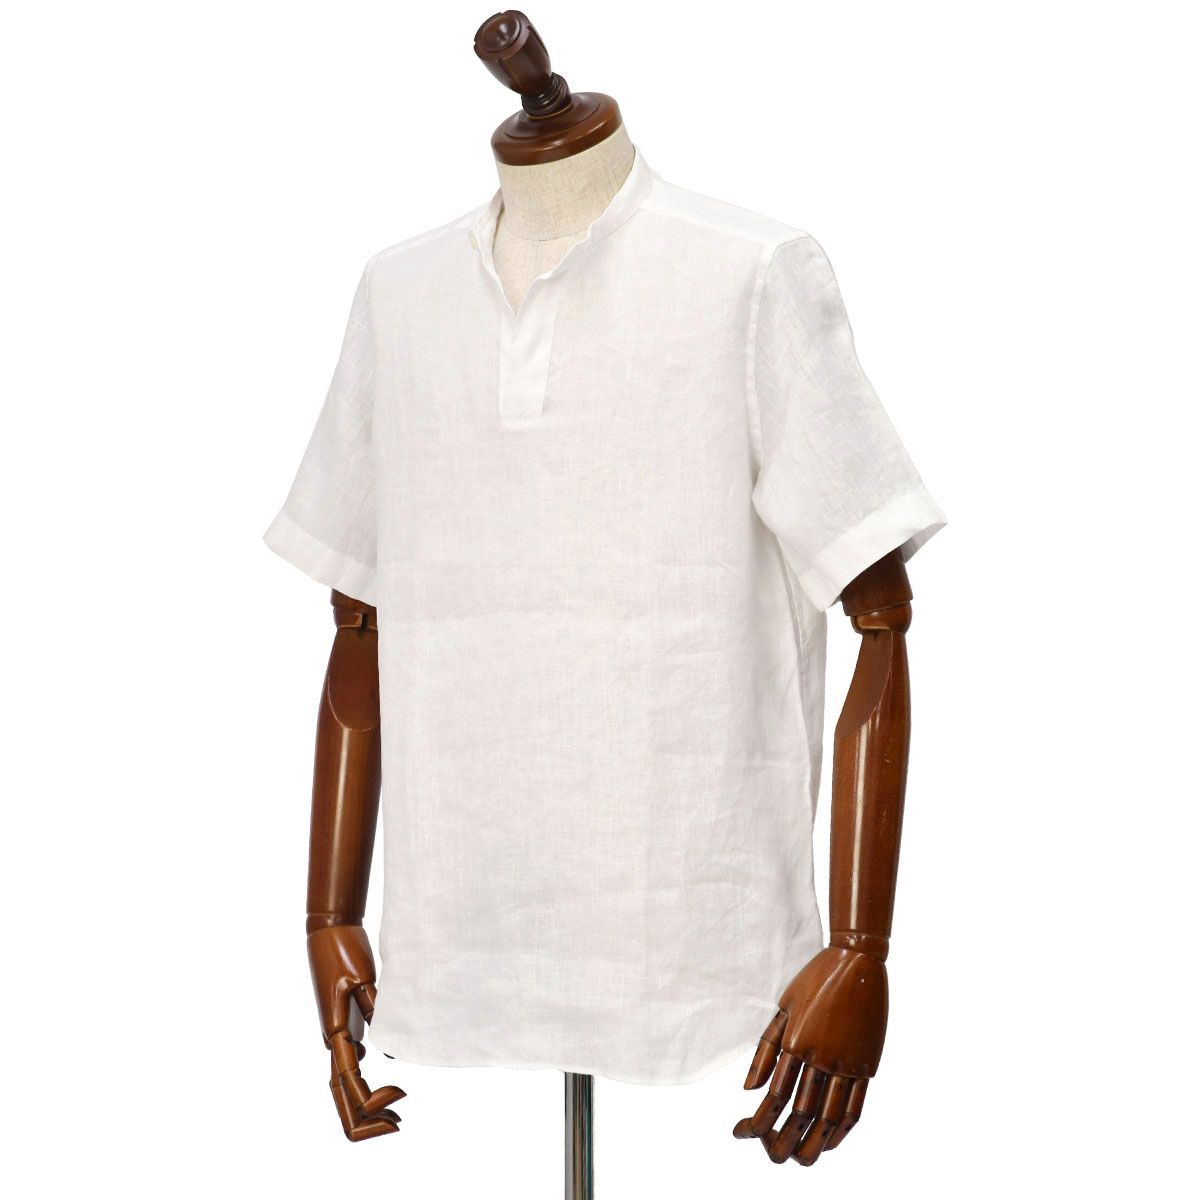 Bagutta【バグッタ】バンドカラープルオーバーシャツをご紹介致します。